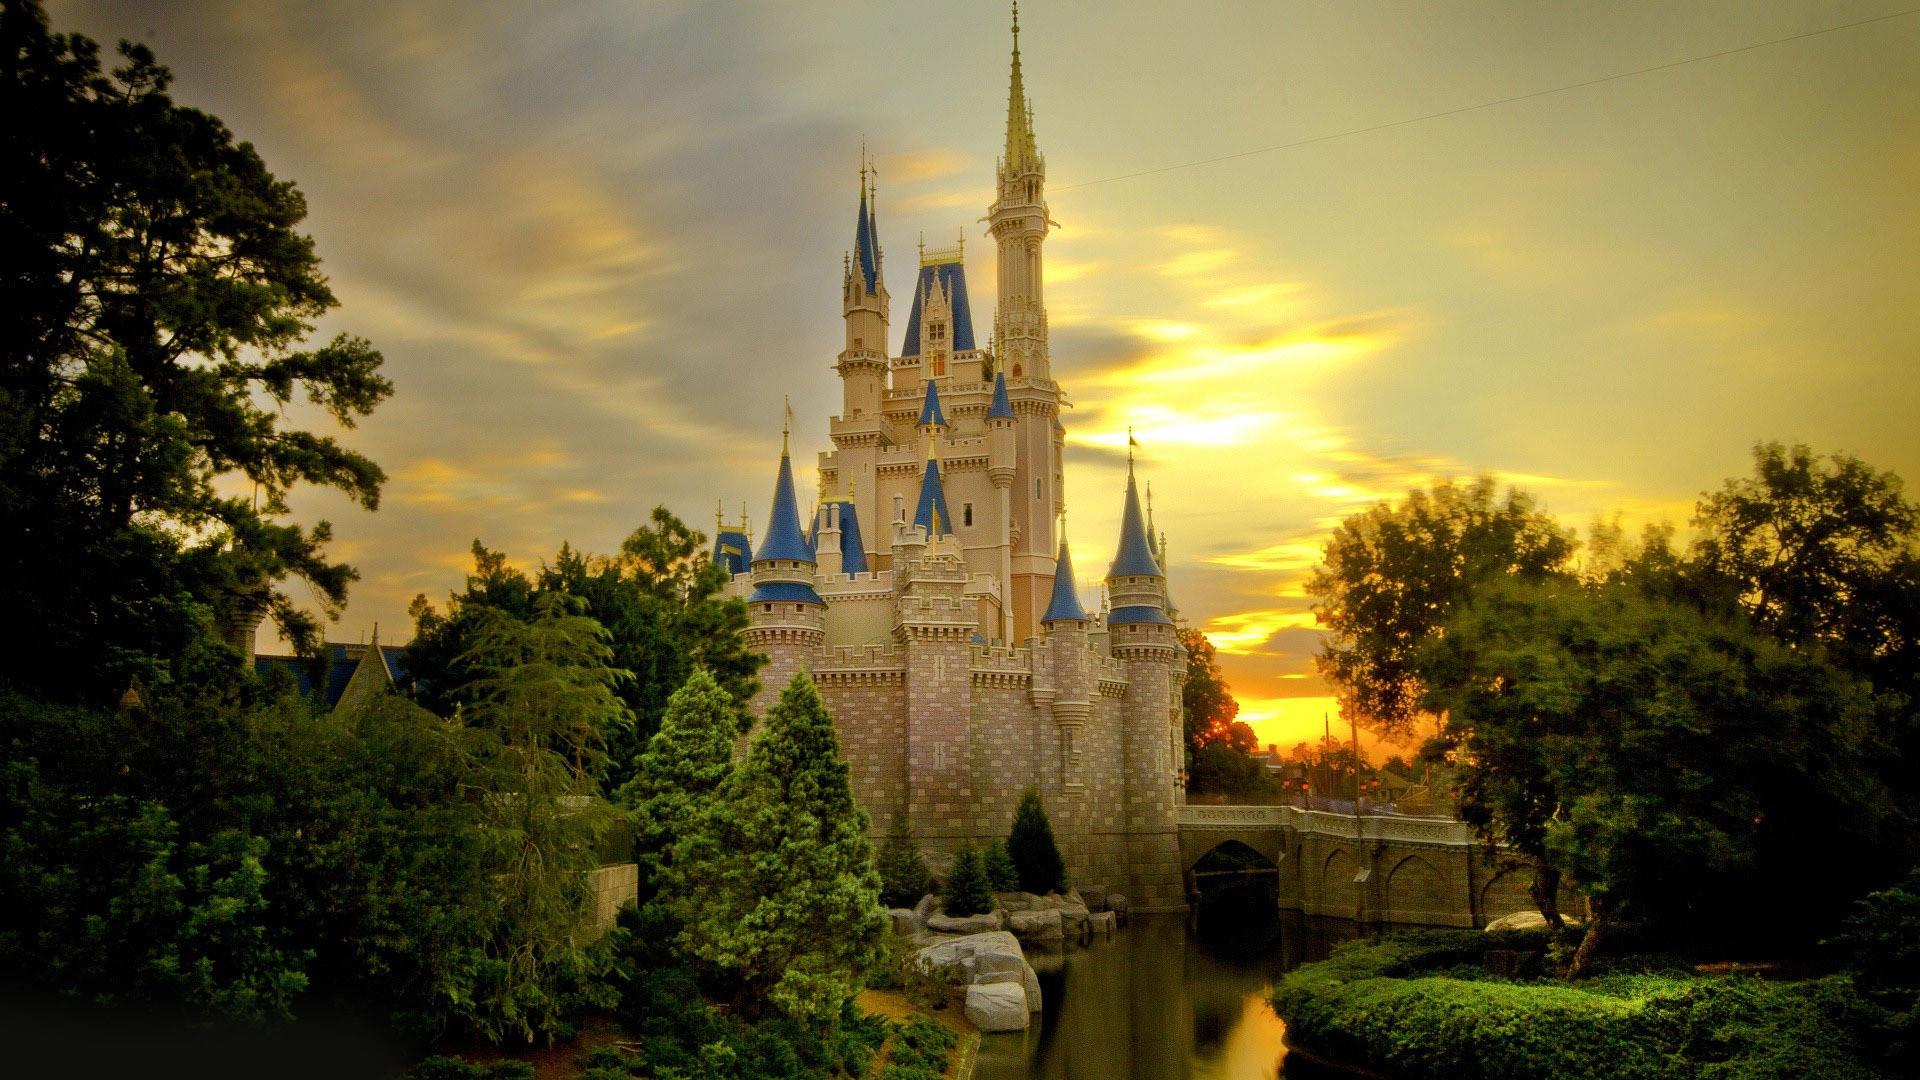 0 Disney Castle Wallpaper HD Download Cinderella Castle wallpaper